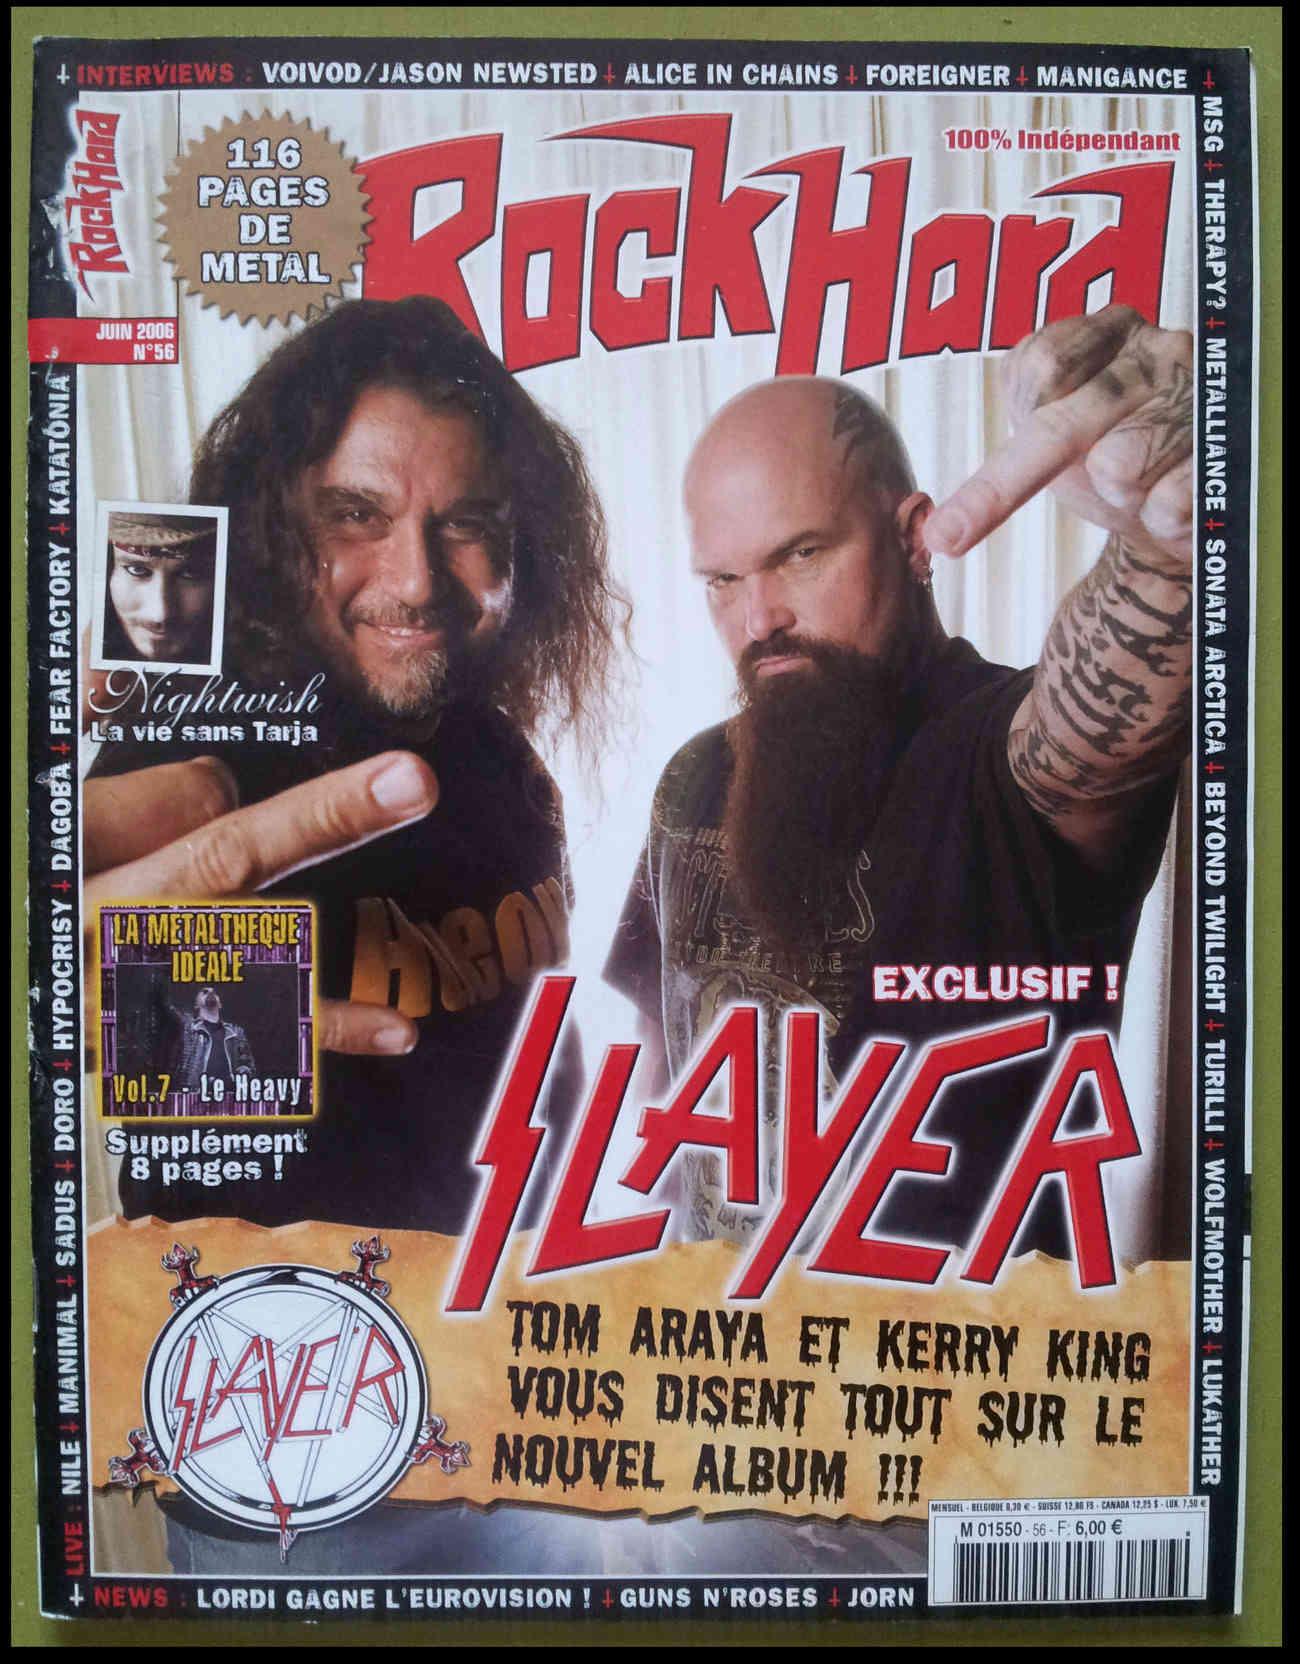 Interview MANIGANCE sur ROCK HARD n°56 JUIN 2006 (Archive) 151